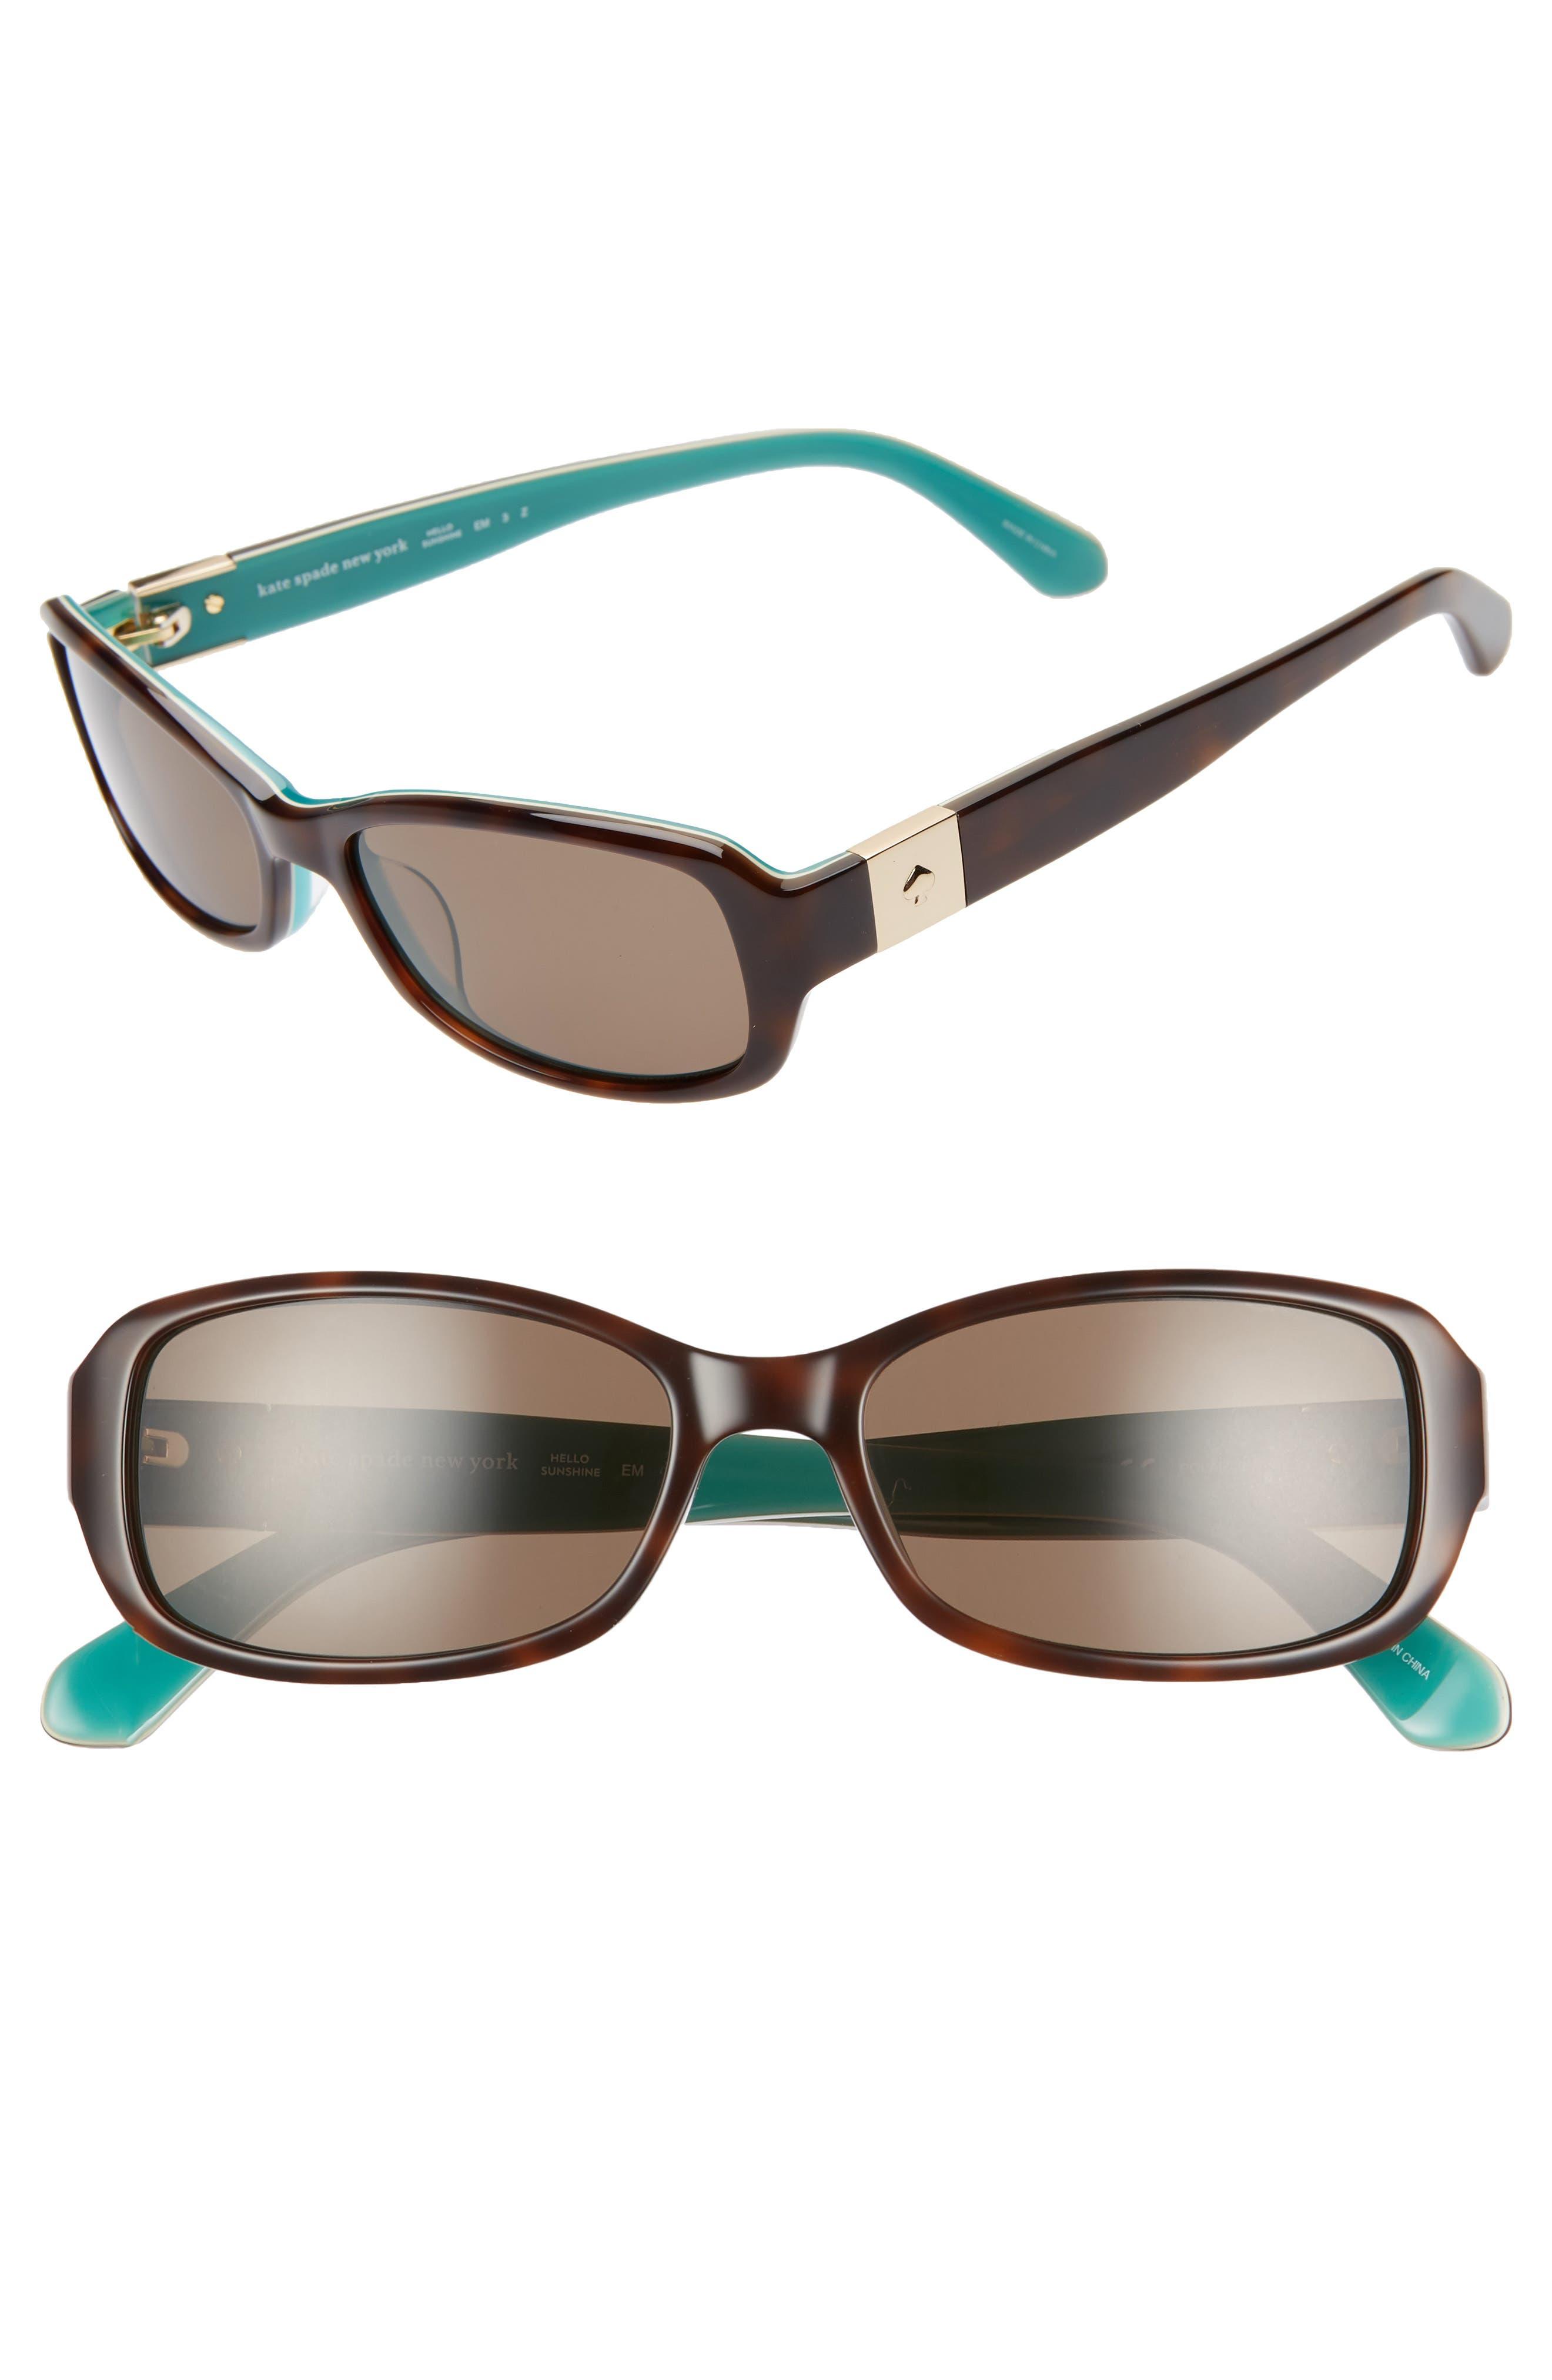 45ee0b661b7 Women s Square Sunglasses   Eyewear  kate spade new york